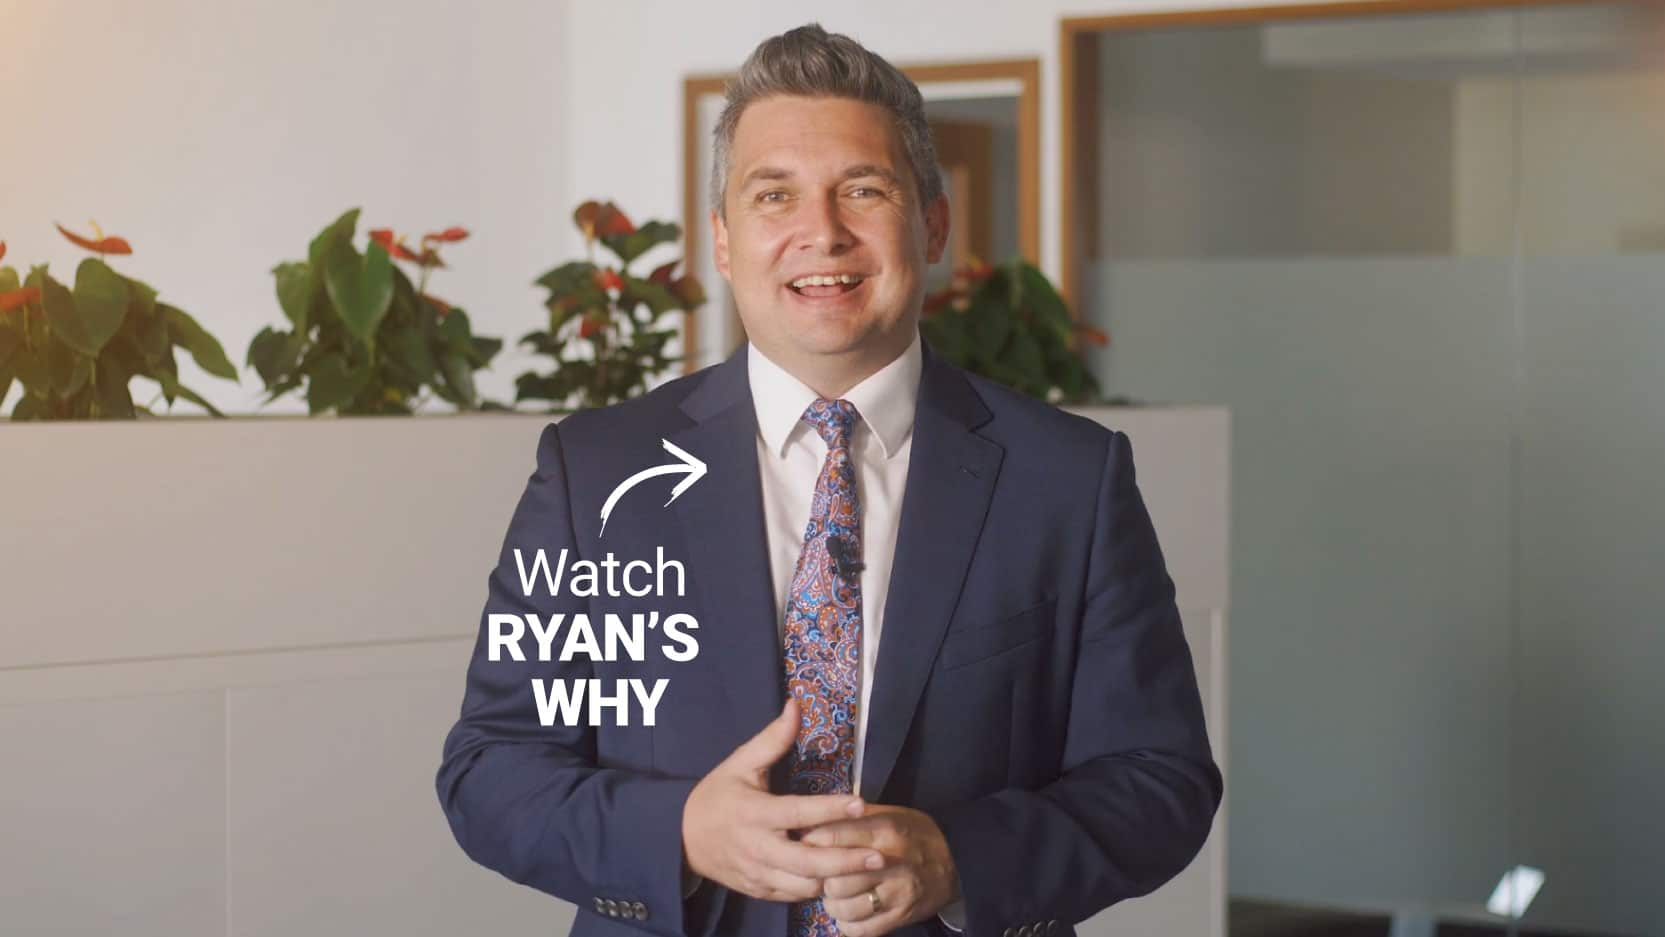 Ryan Wood - Why I do what I do